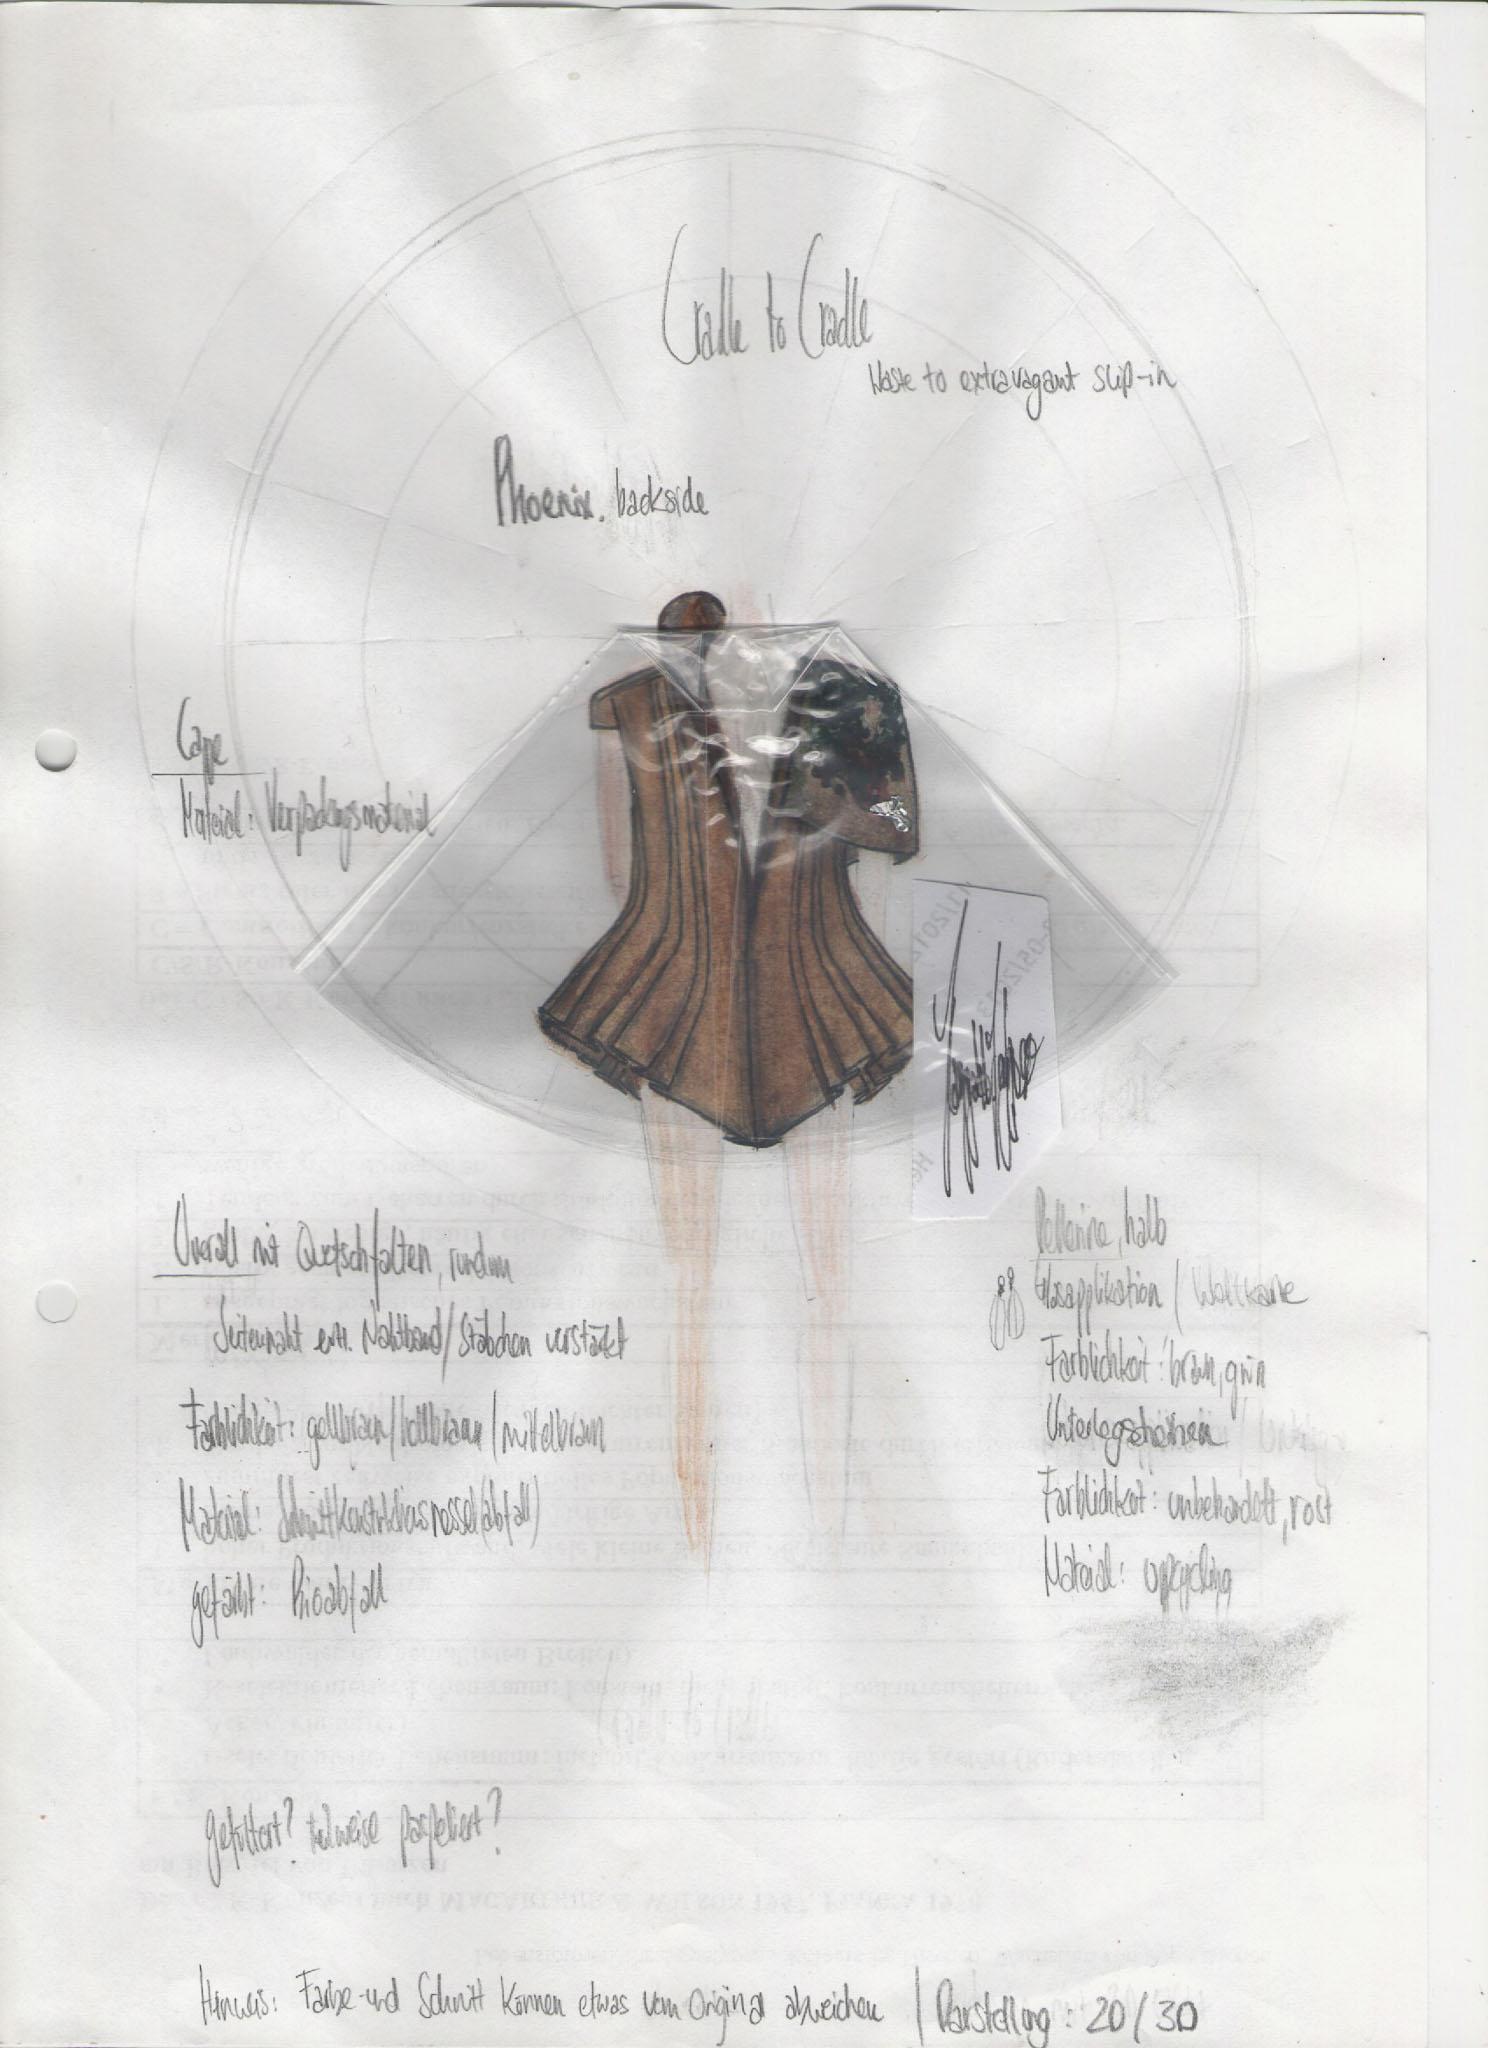 Phoenix: Hannah Alma Sundhauser, Germany, Student, Modeinstitut Gabriel (Cradle to Cradle)